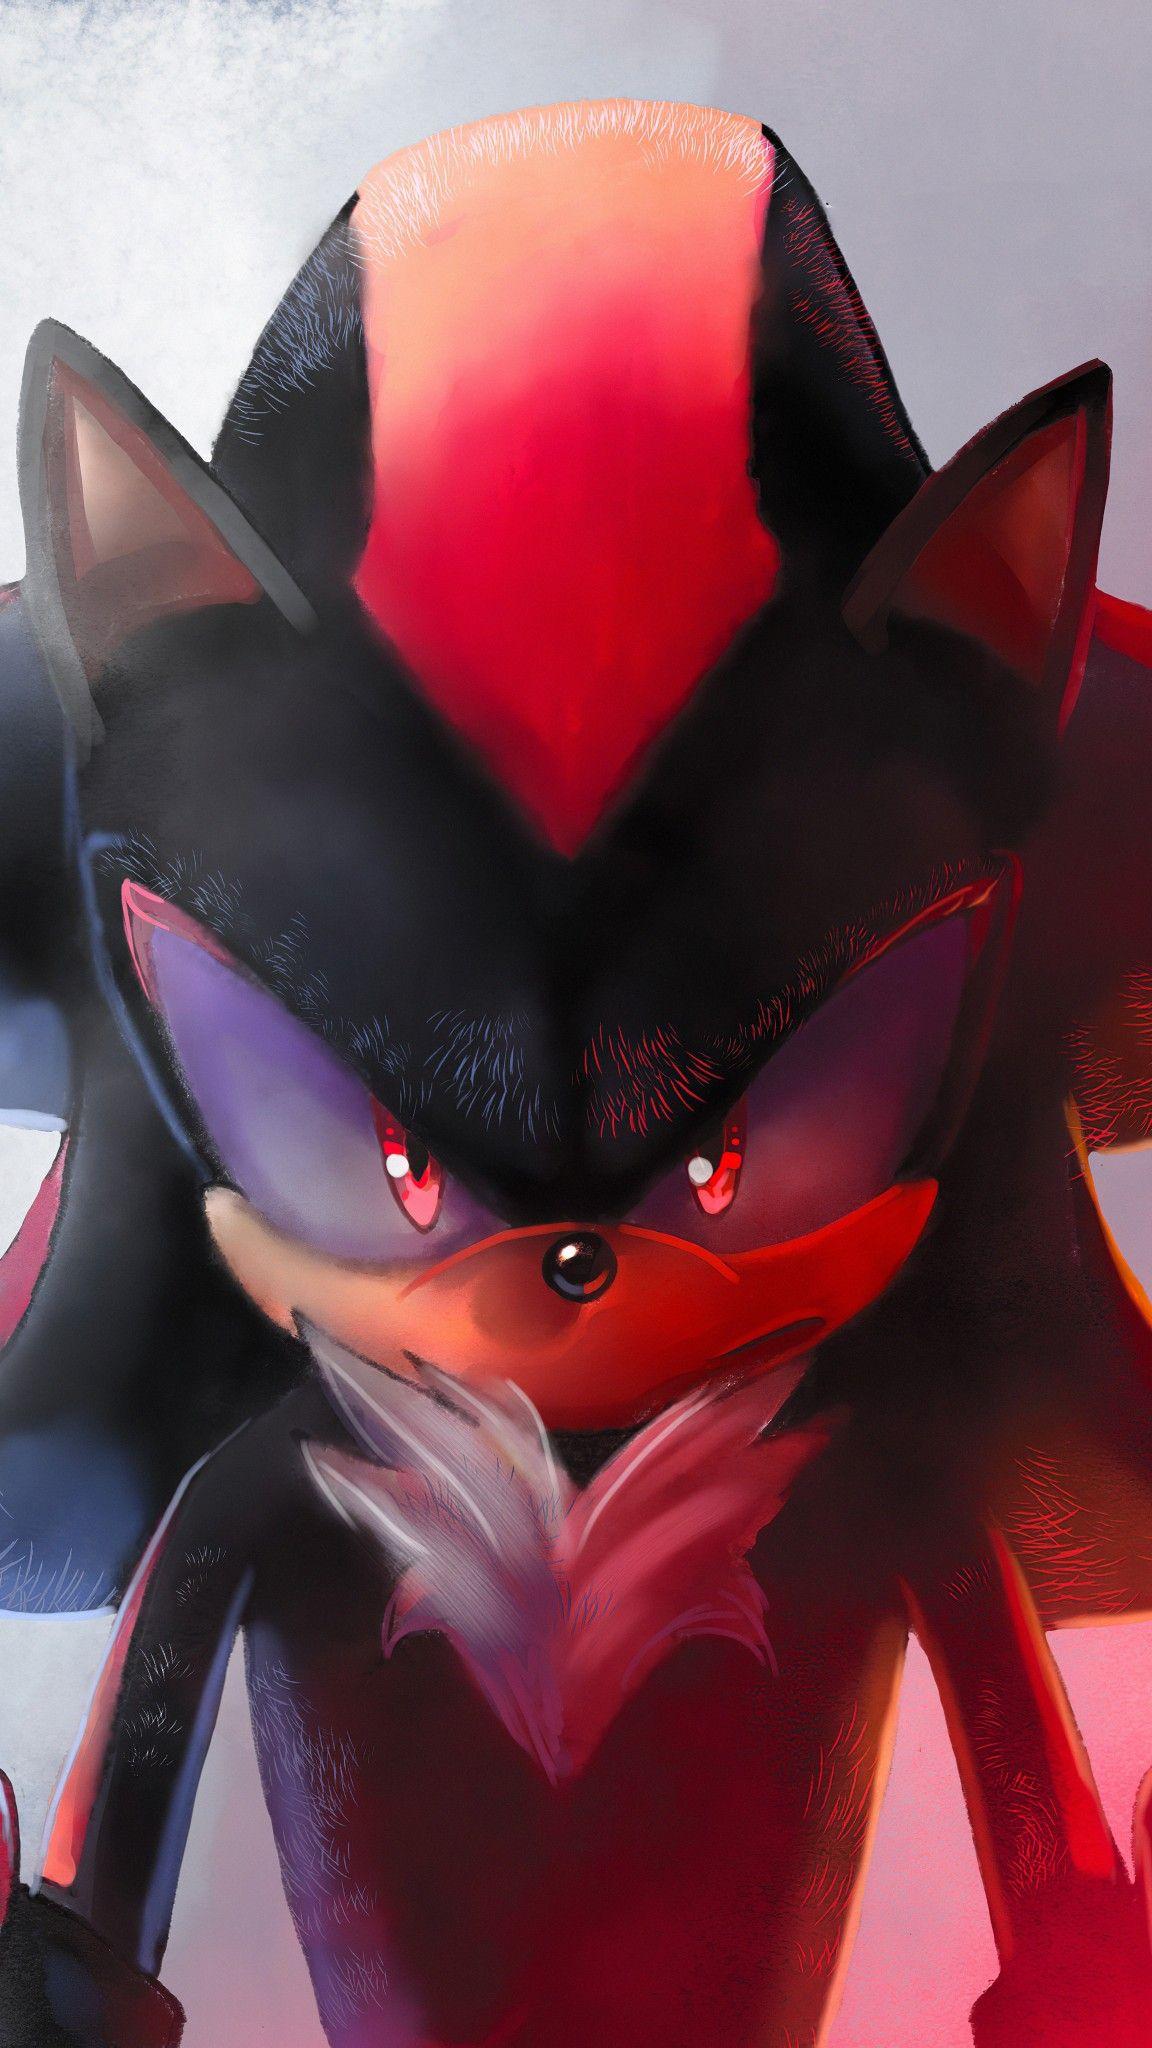 Shadow the Hedgehog | Shadow the hedgehog, Sonic, Sonic ...